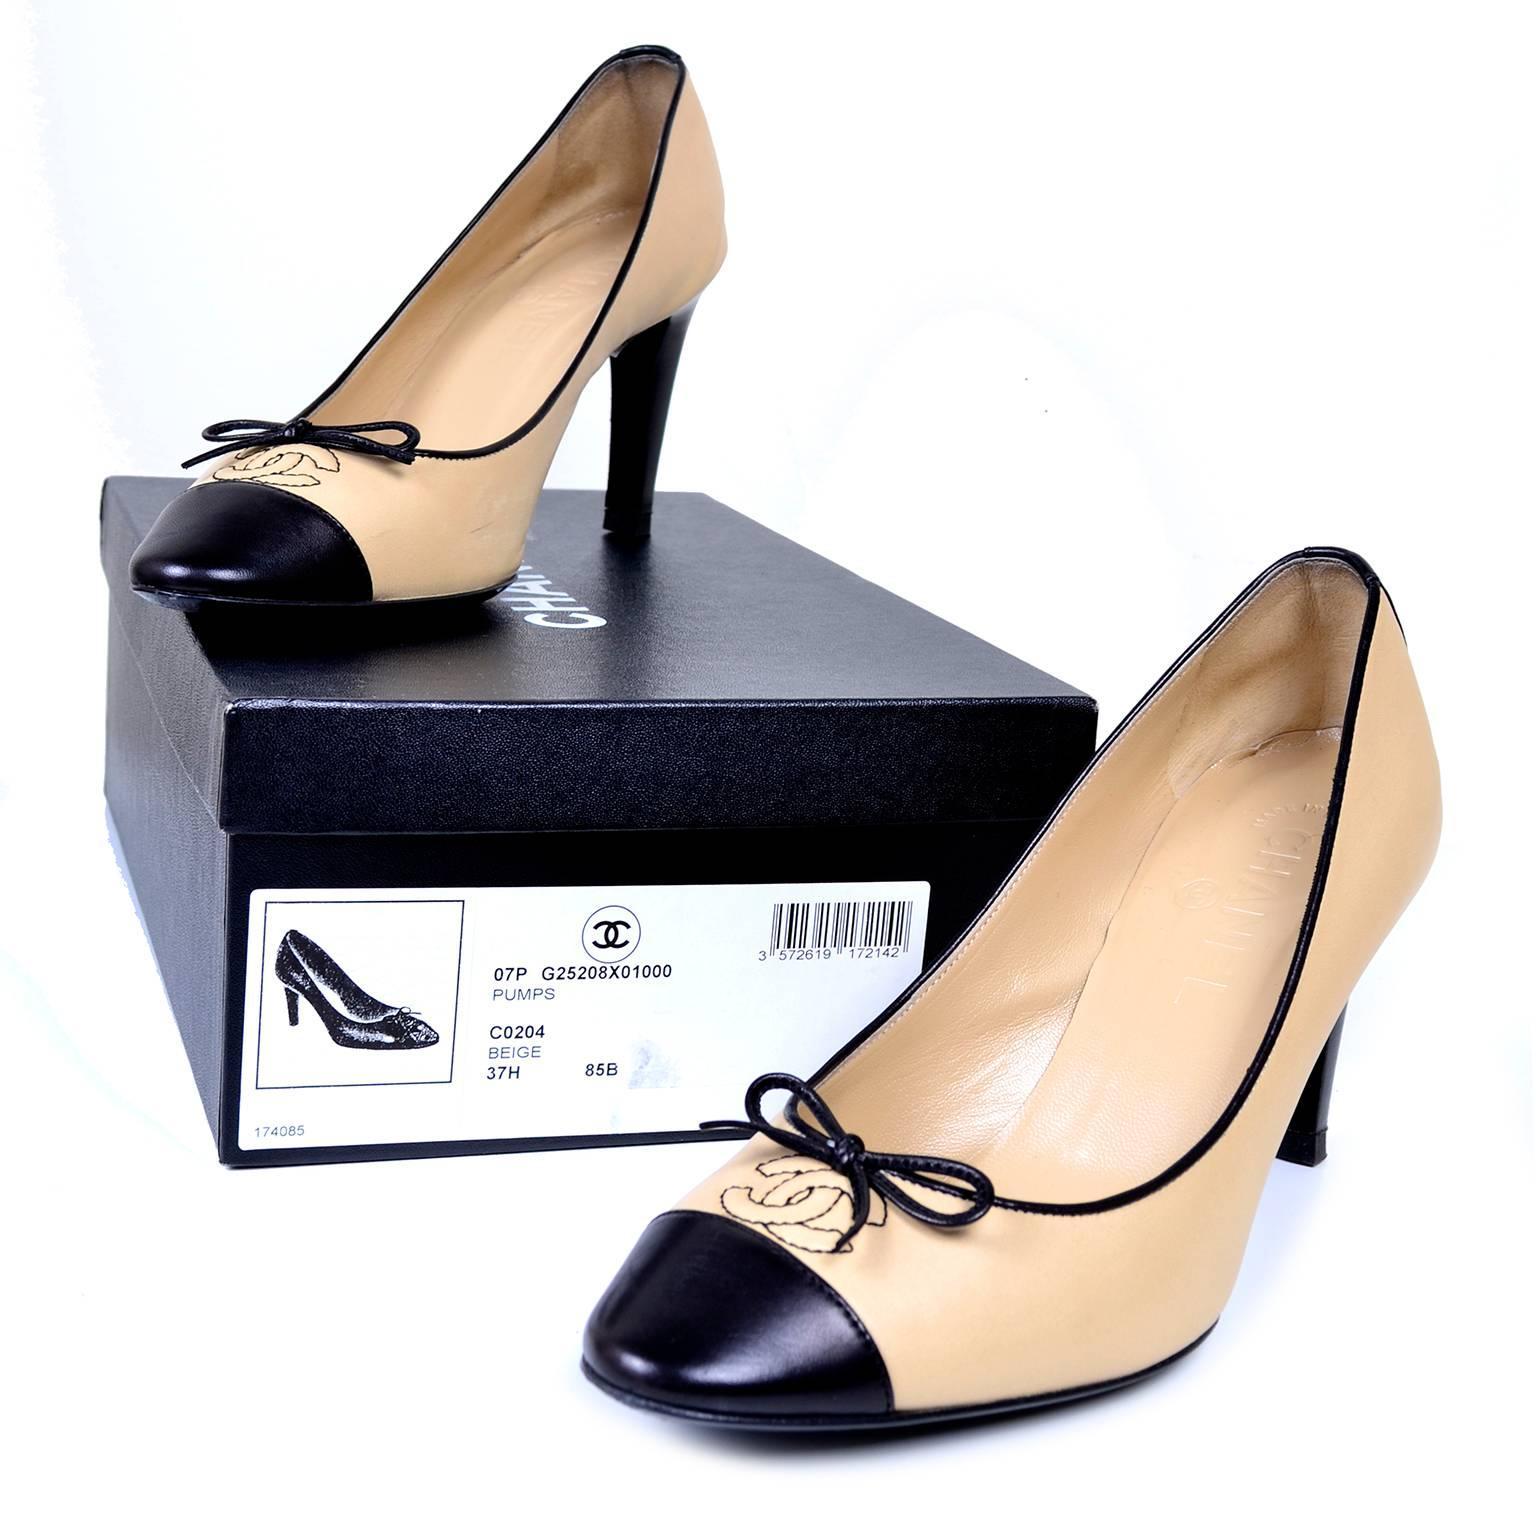 Beige And Black Heels KXSMM41A